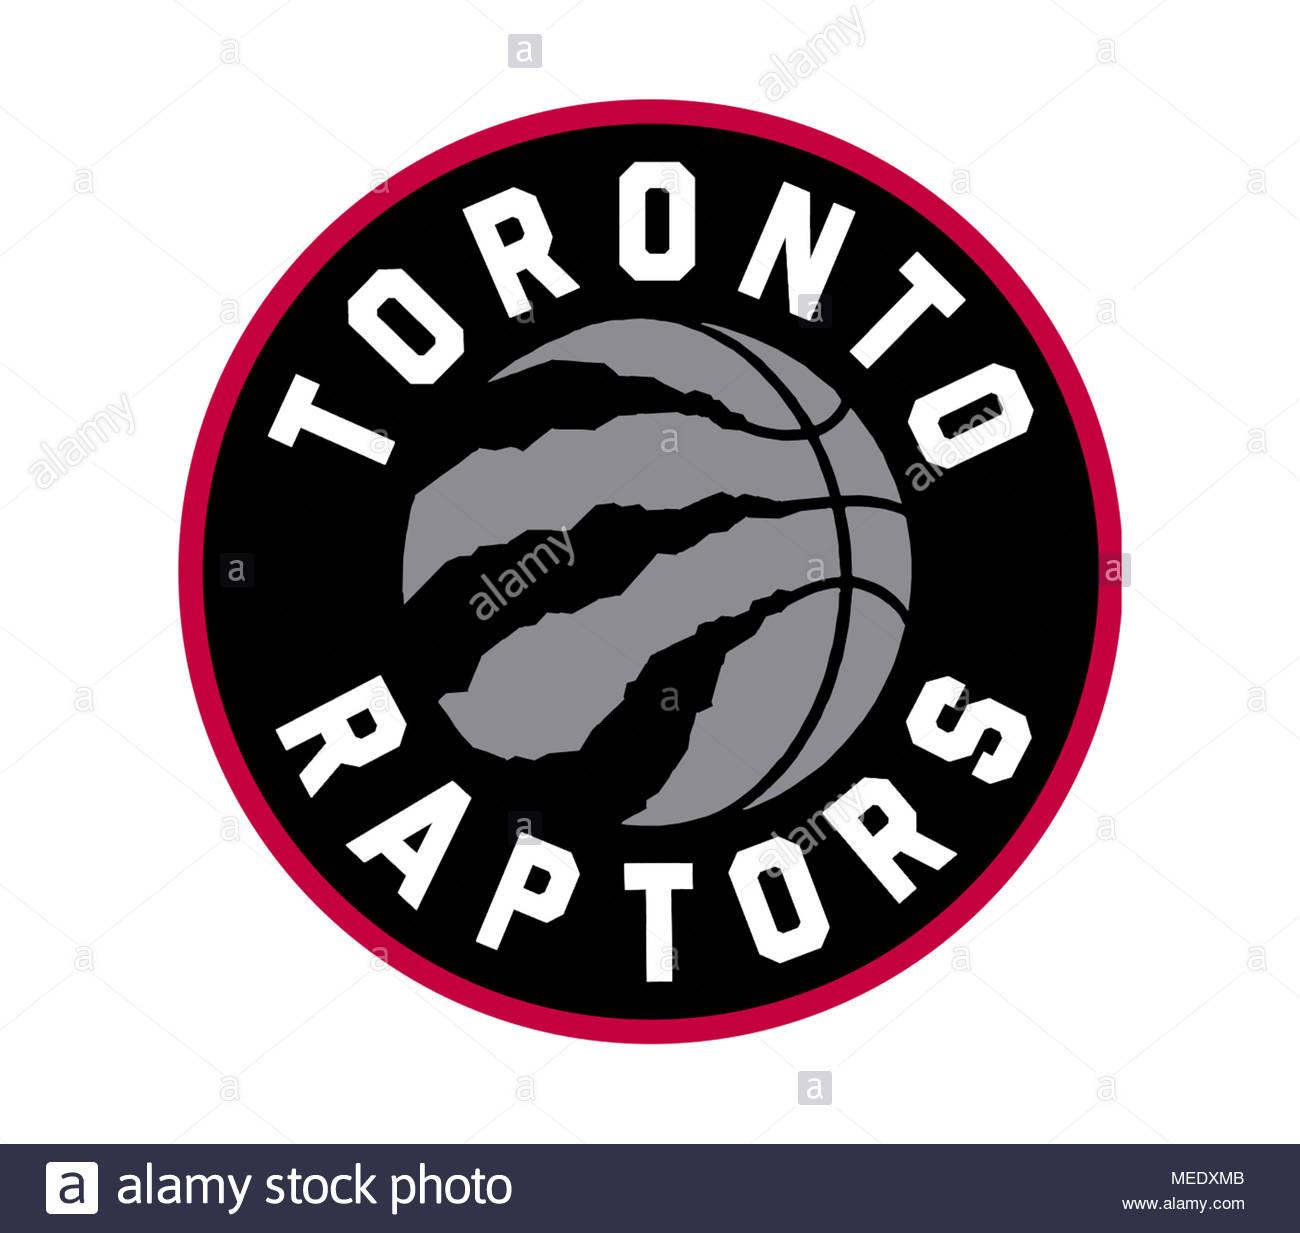 Toronto Raptors icon logo - Stock Image